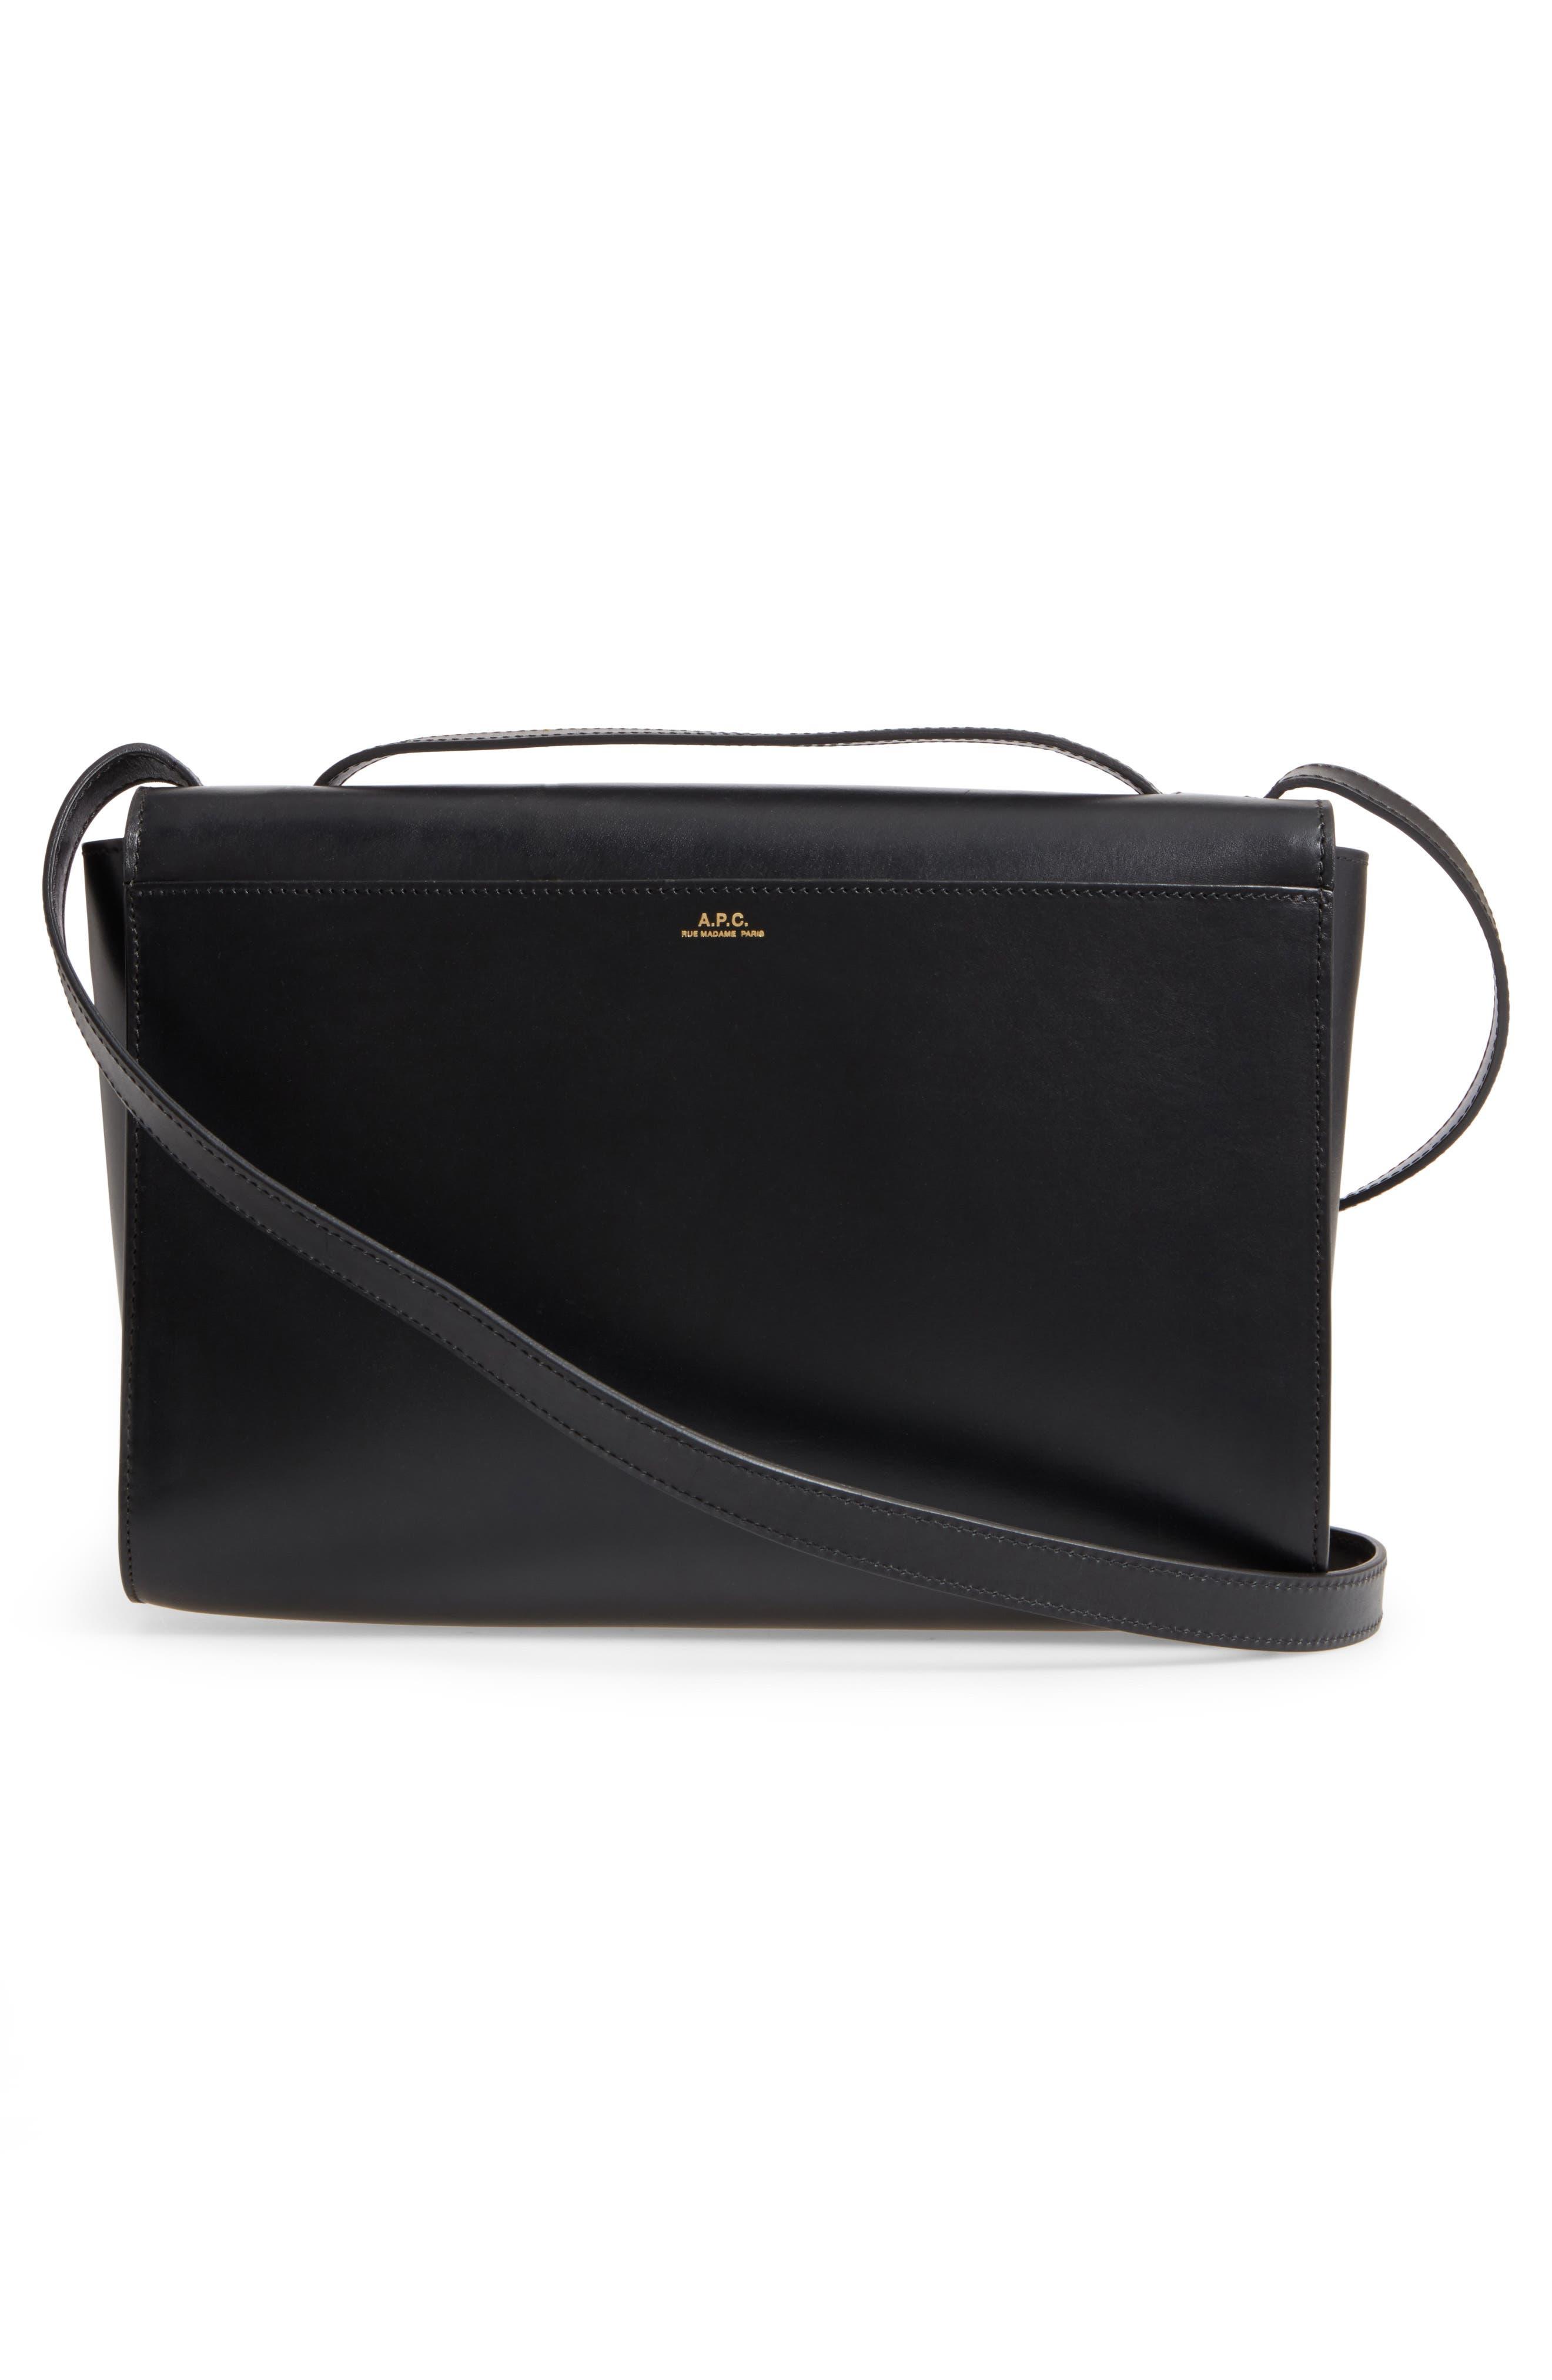 Alternate Image 2  - A.P.C. Katy Calfskin Leather Messenger Bag